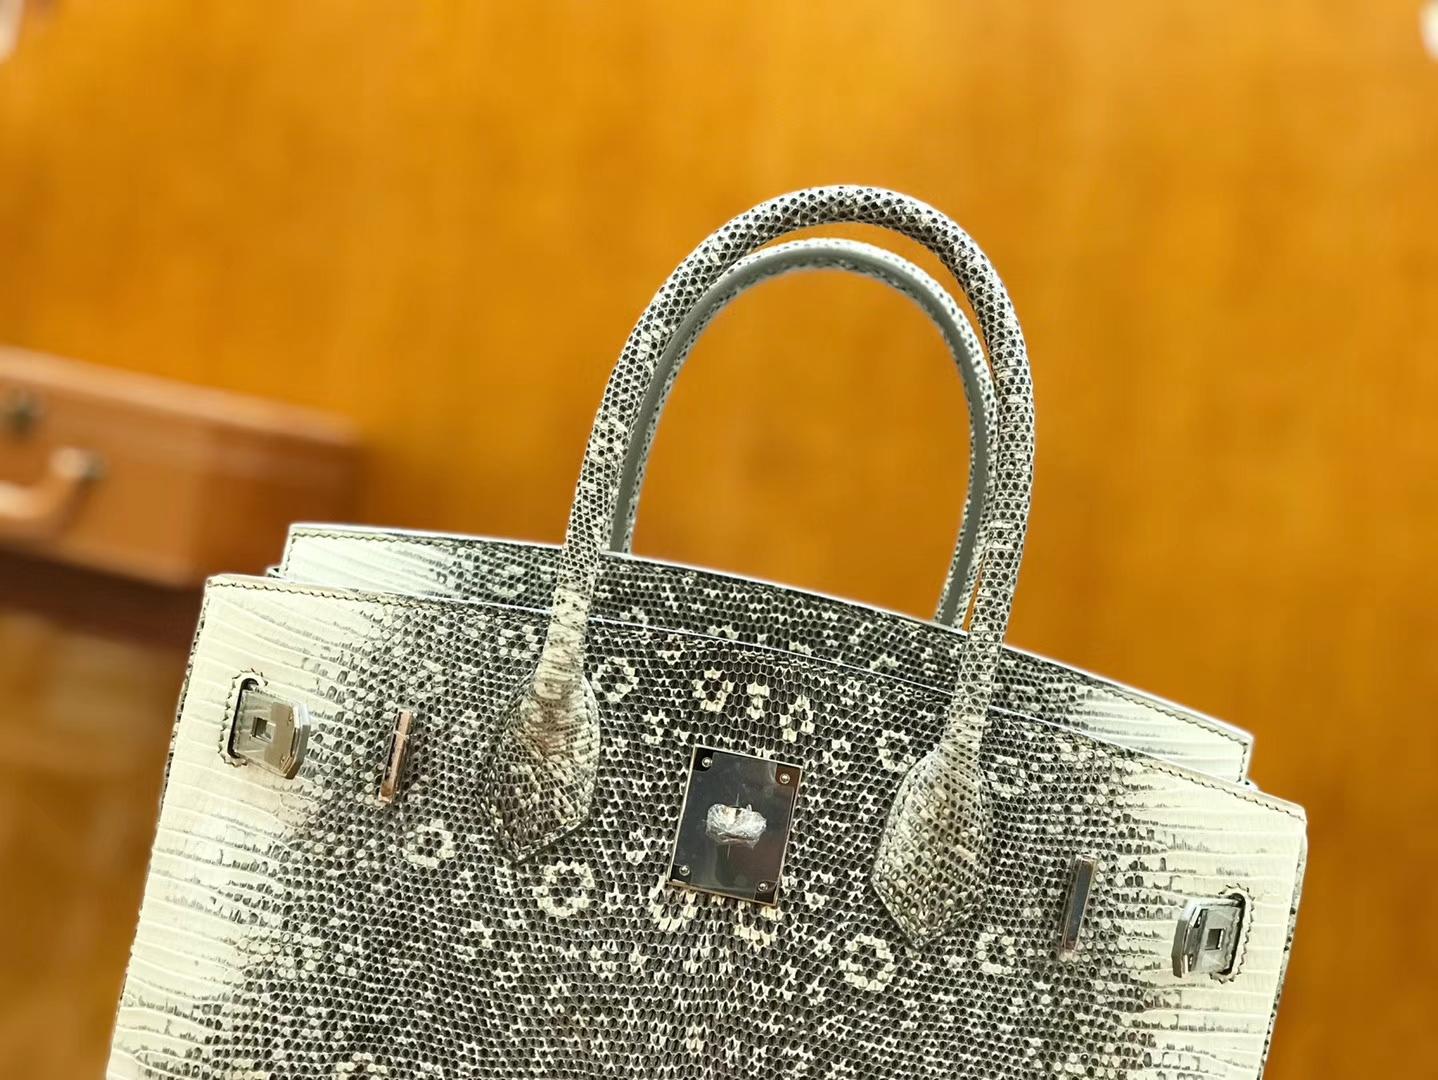 Hermès(爱马仕)Birkin 30cm 原色 雪花蜥蜴皮 全手工缝制 稀有